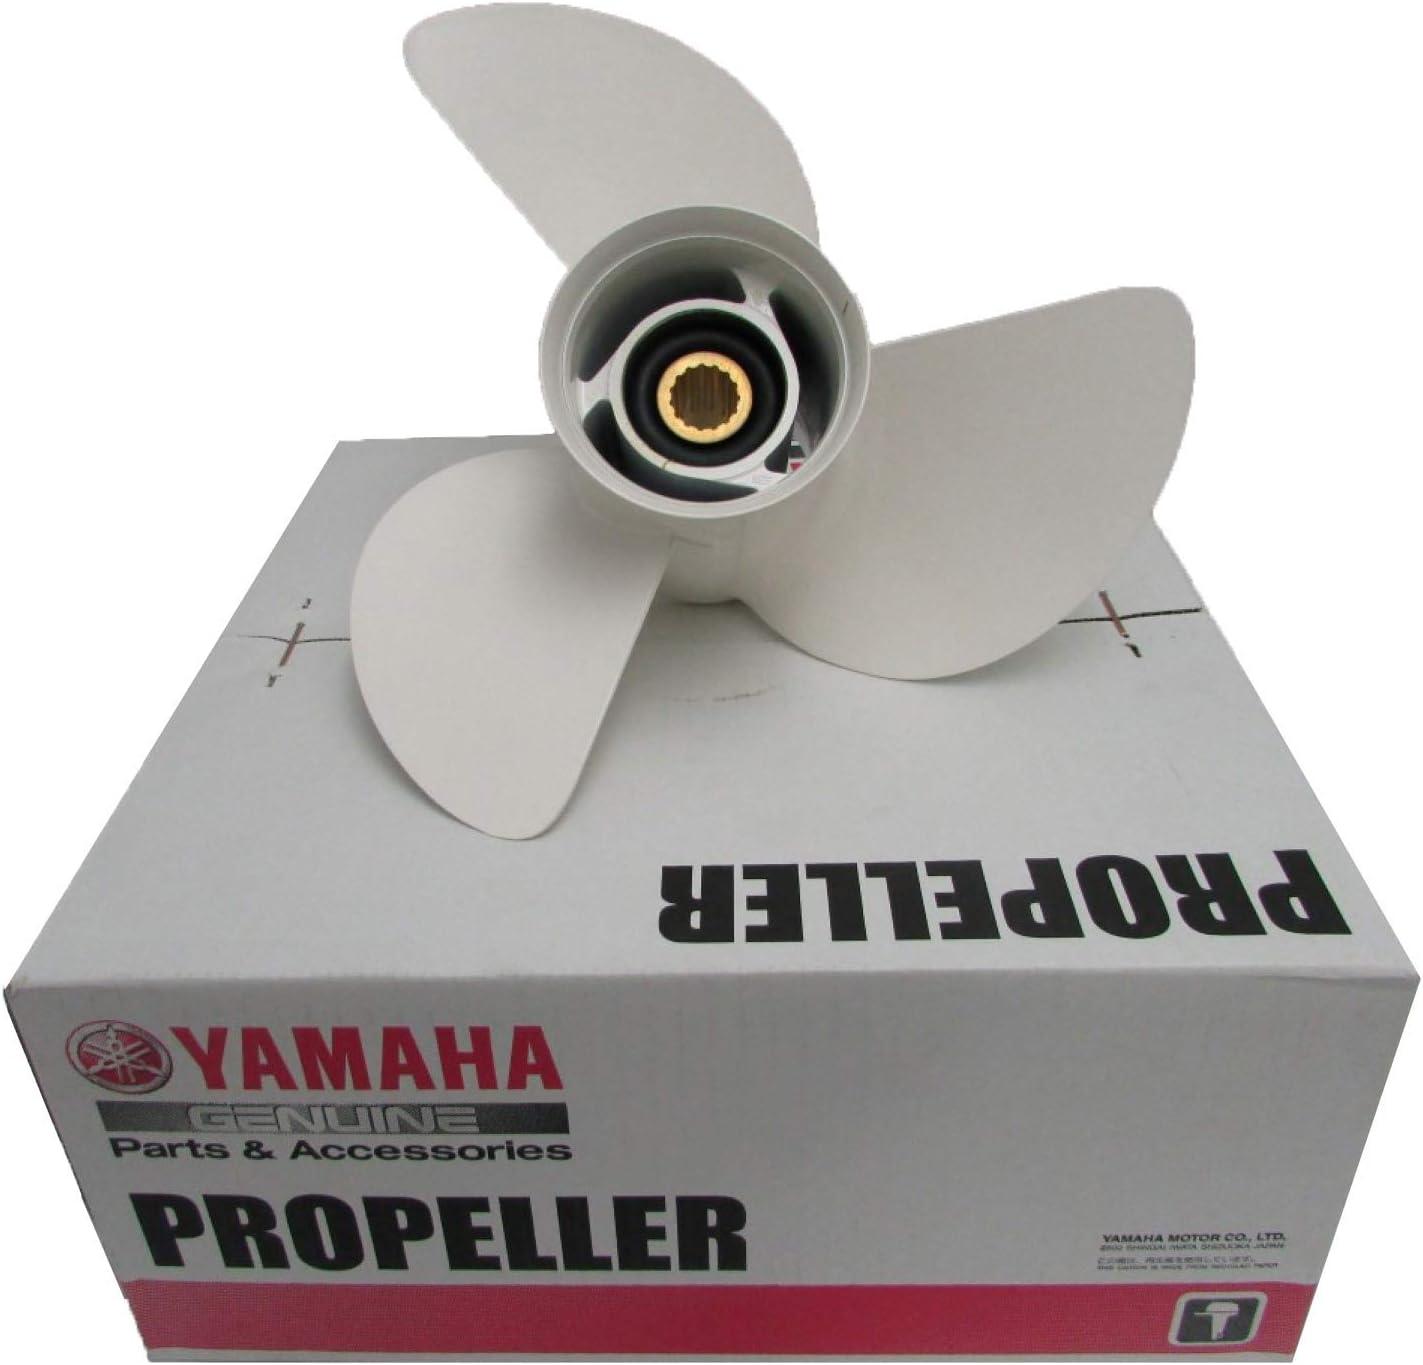 OEM Yamaha Aluminum 3 Blade Prop Propeller 13 1/2 x 15 6E5-45947-00-00